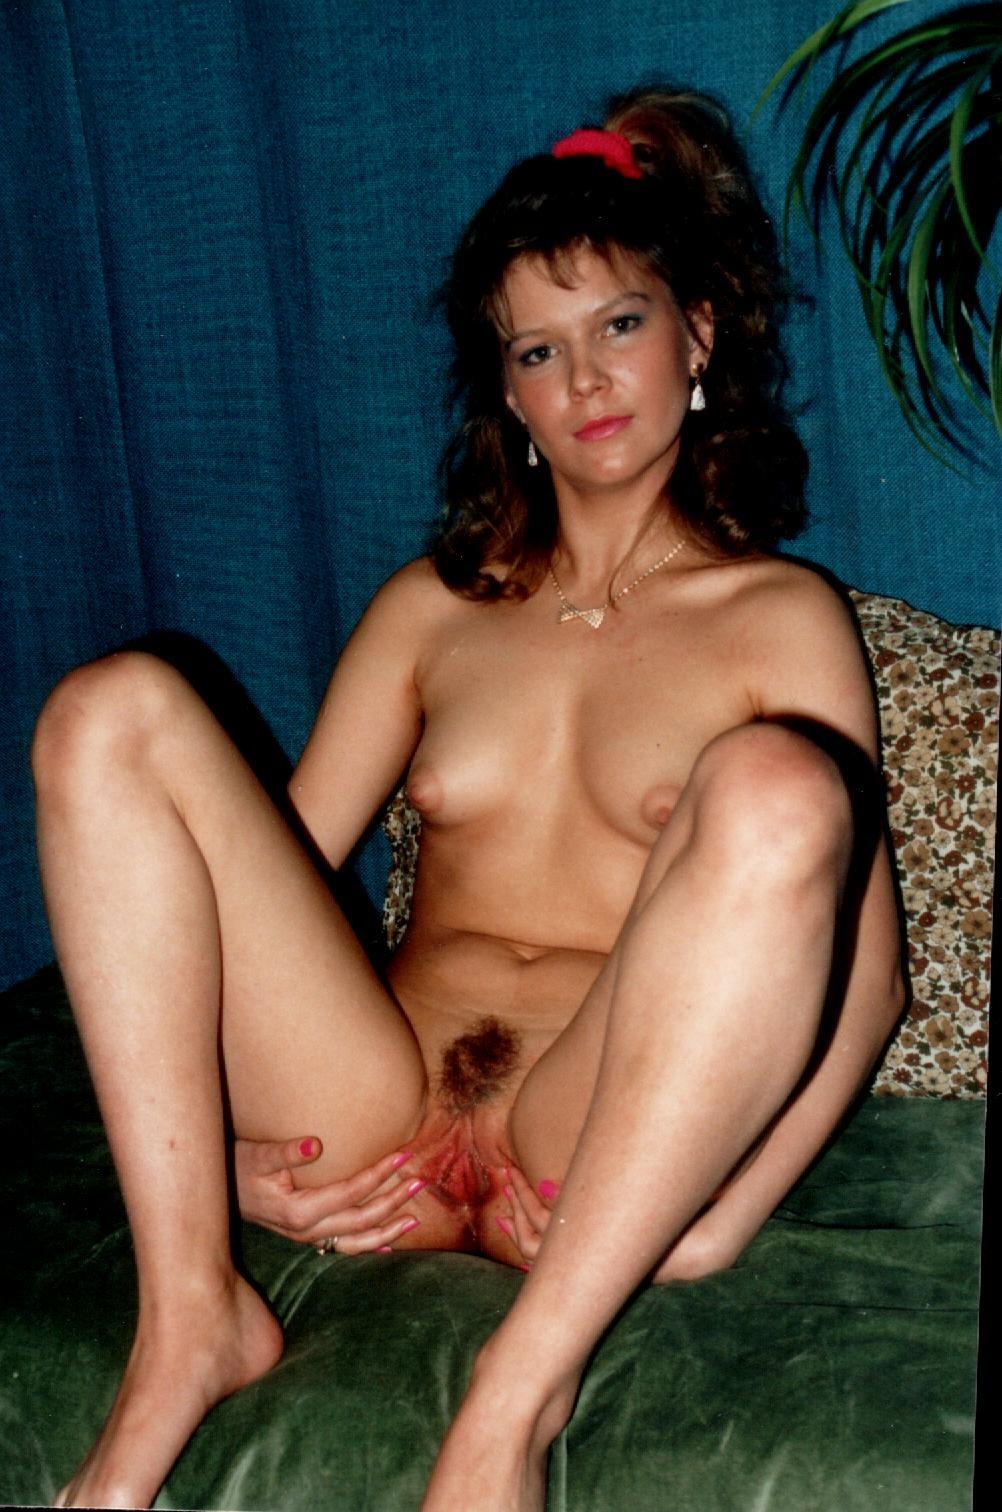 amateur retro erotic sexy naked ladies